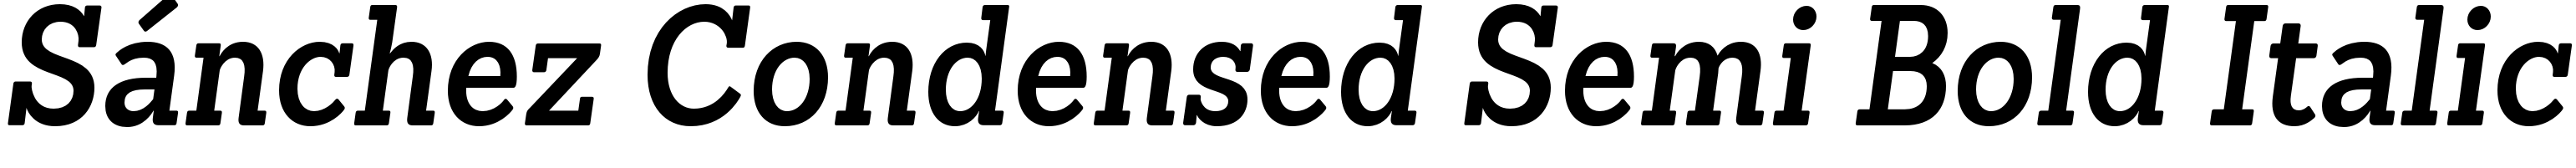 Sánchez Condensed Semi Bold Italic